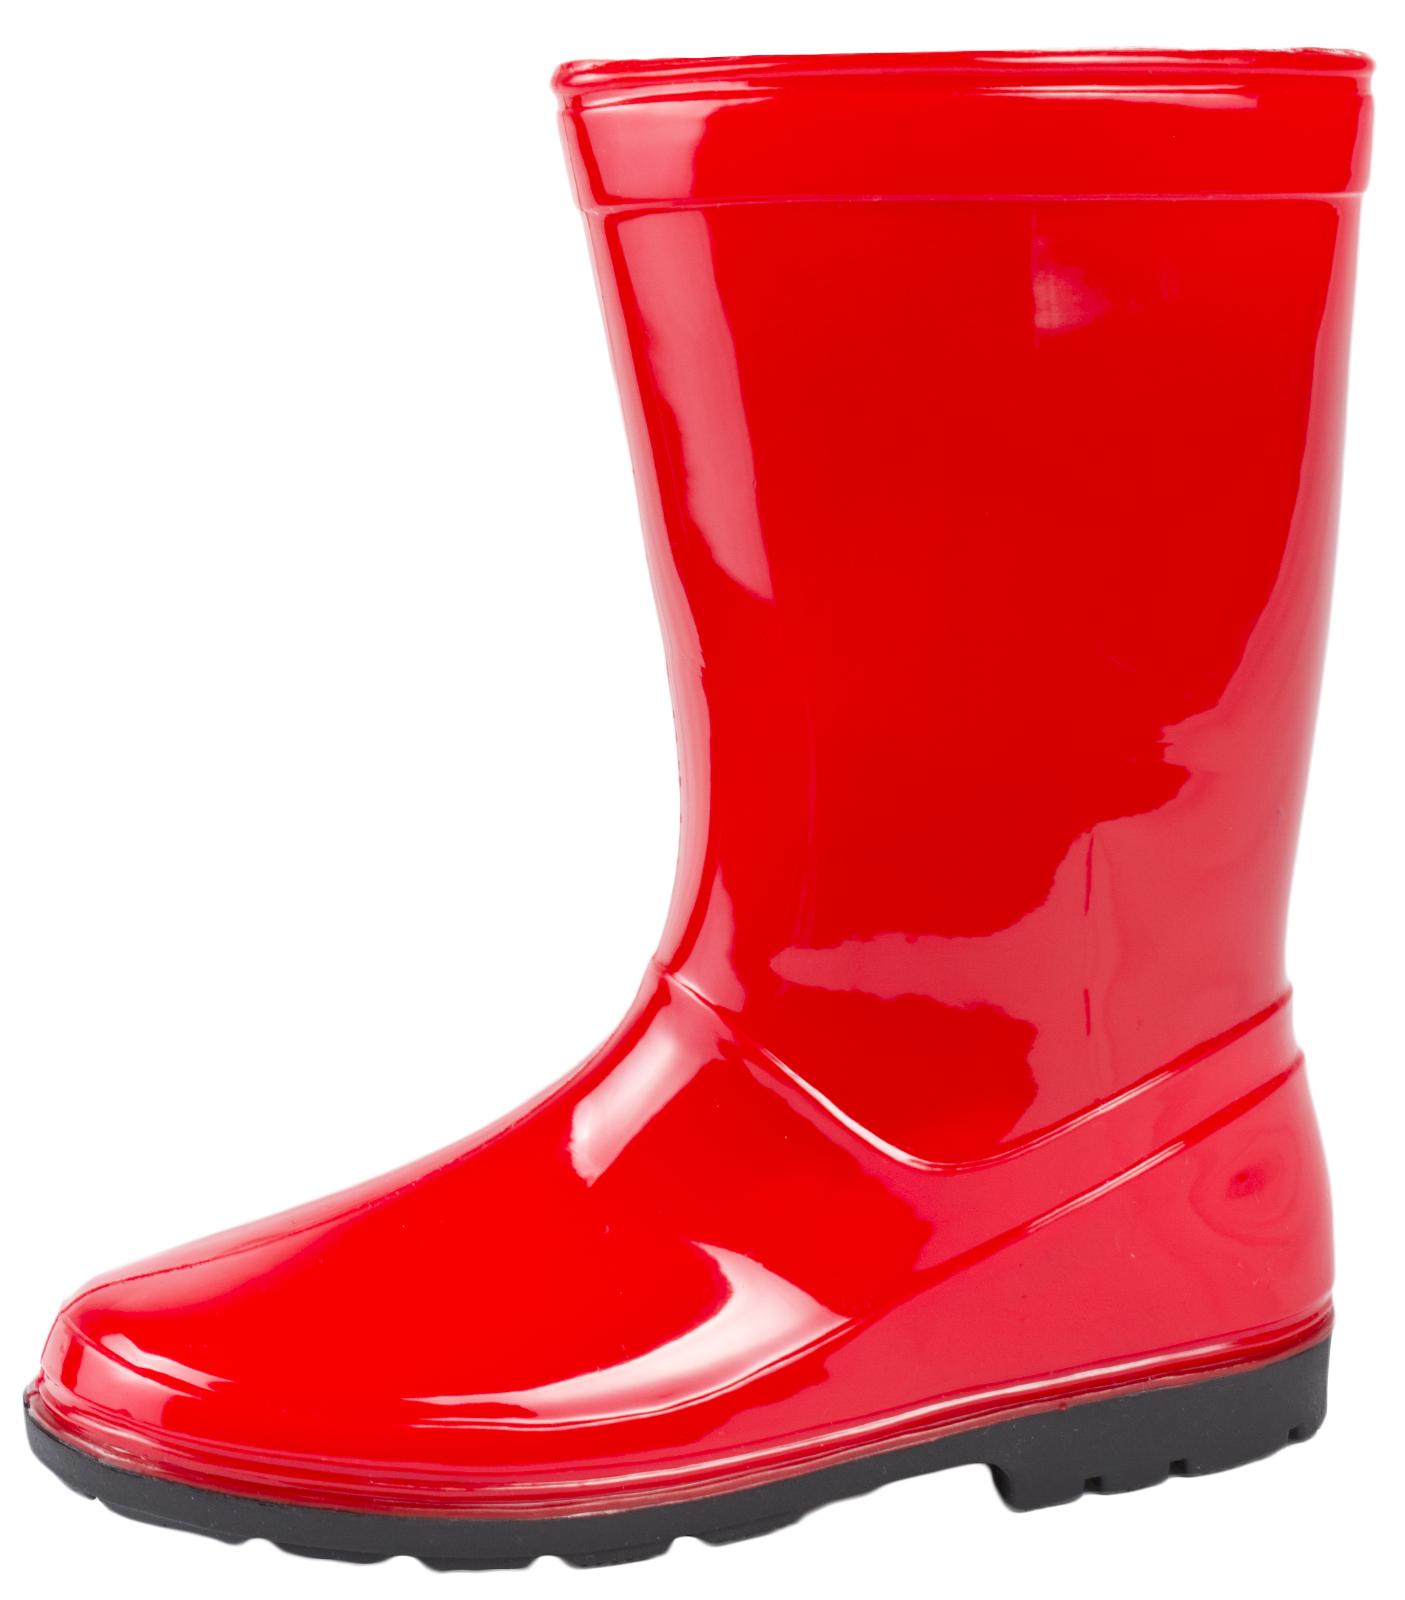 Kids Boys Girls Mid Calf Rain Snow Boots Wellies Wellingtons ...